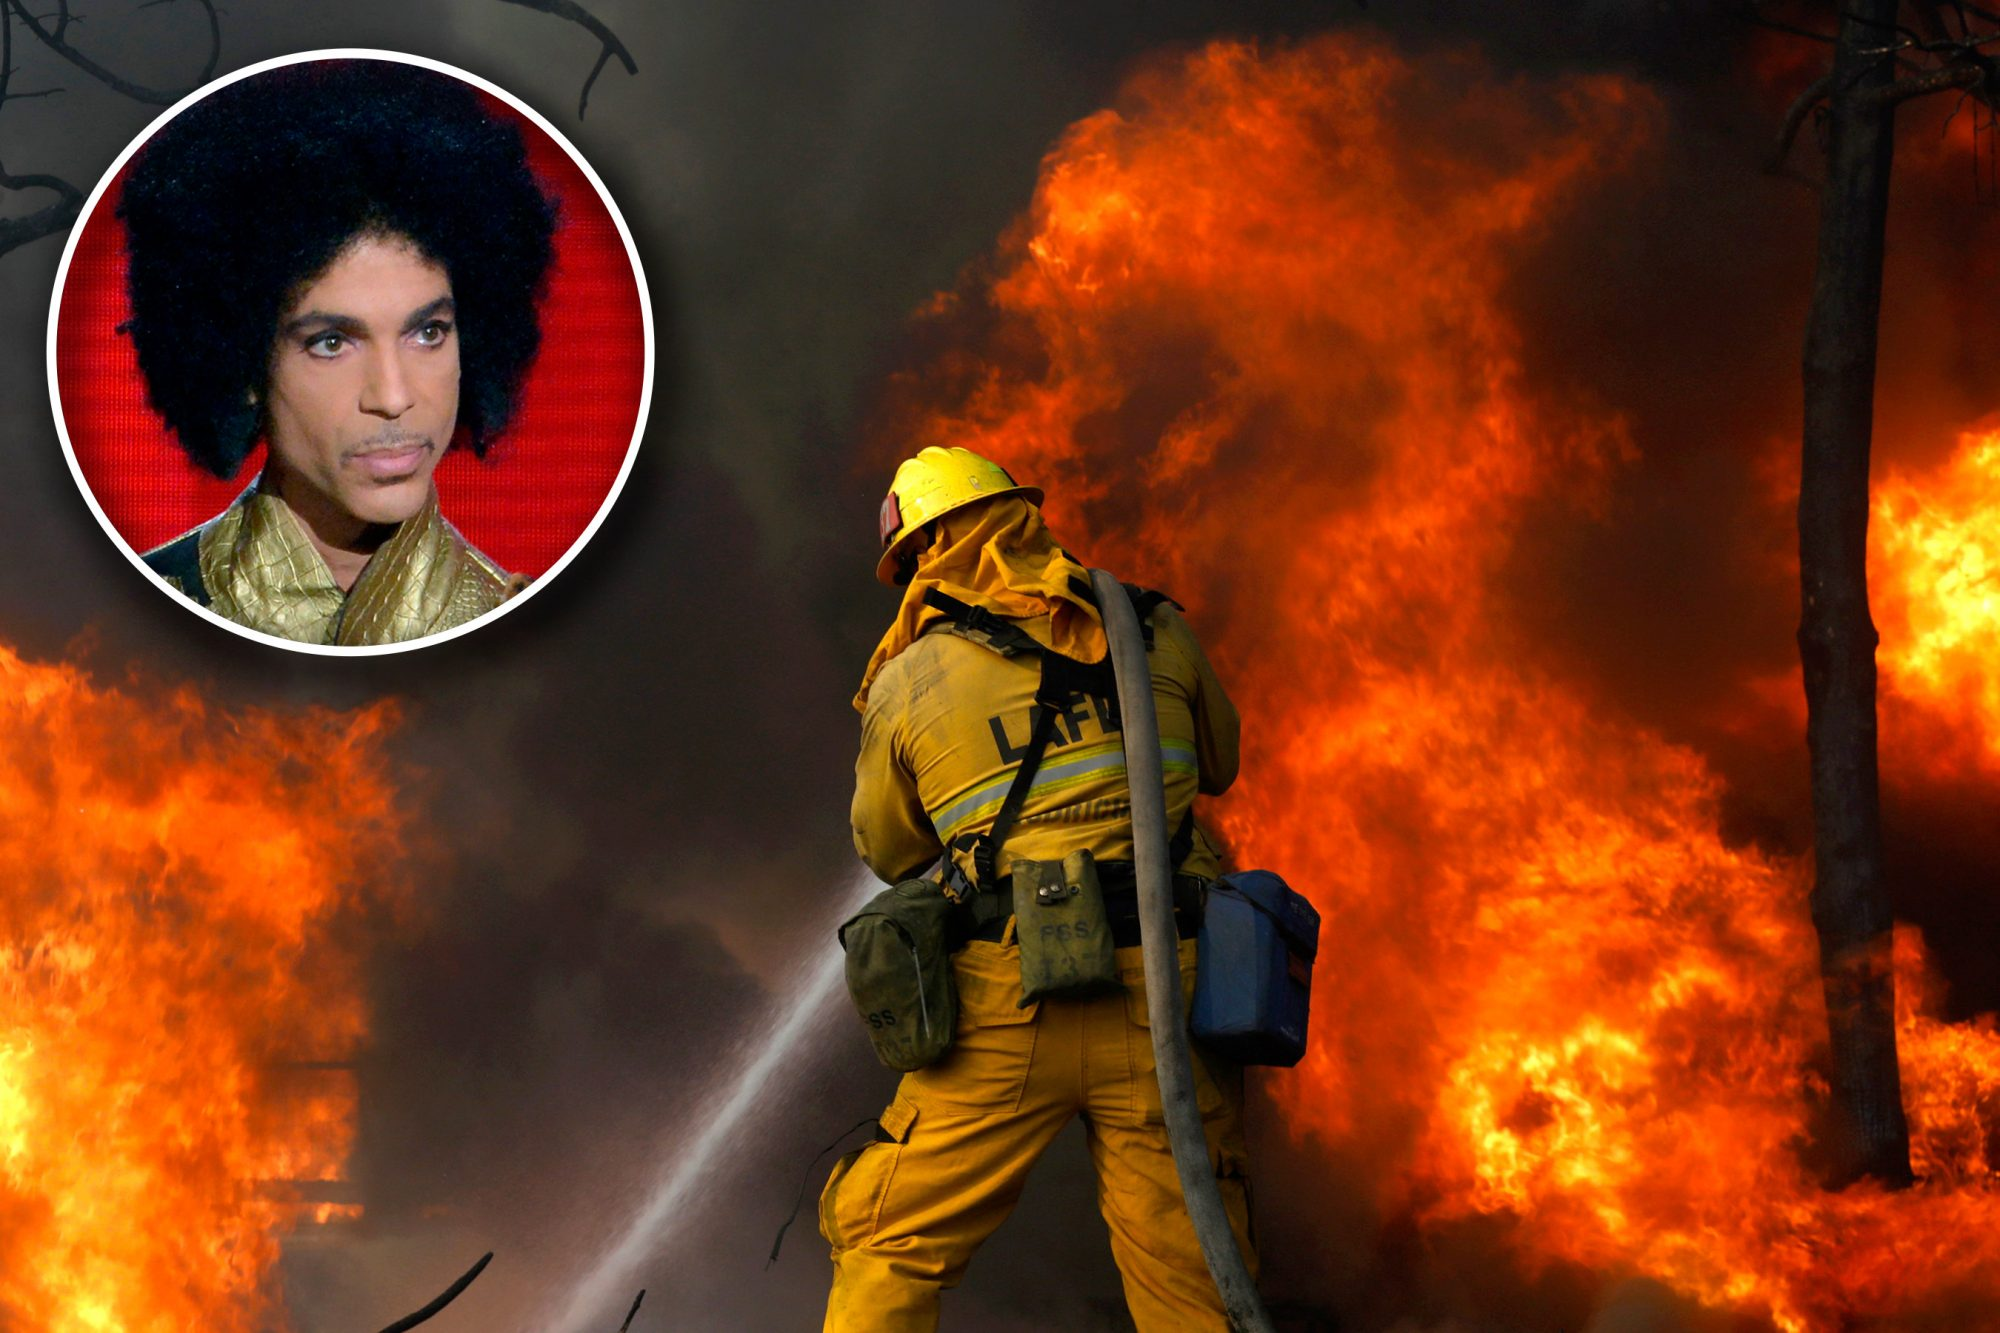 Prince / Skirball fire